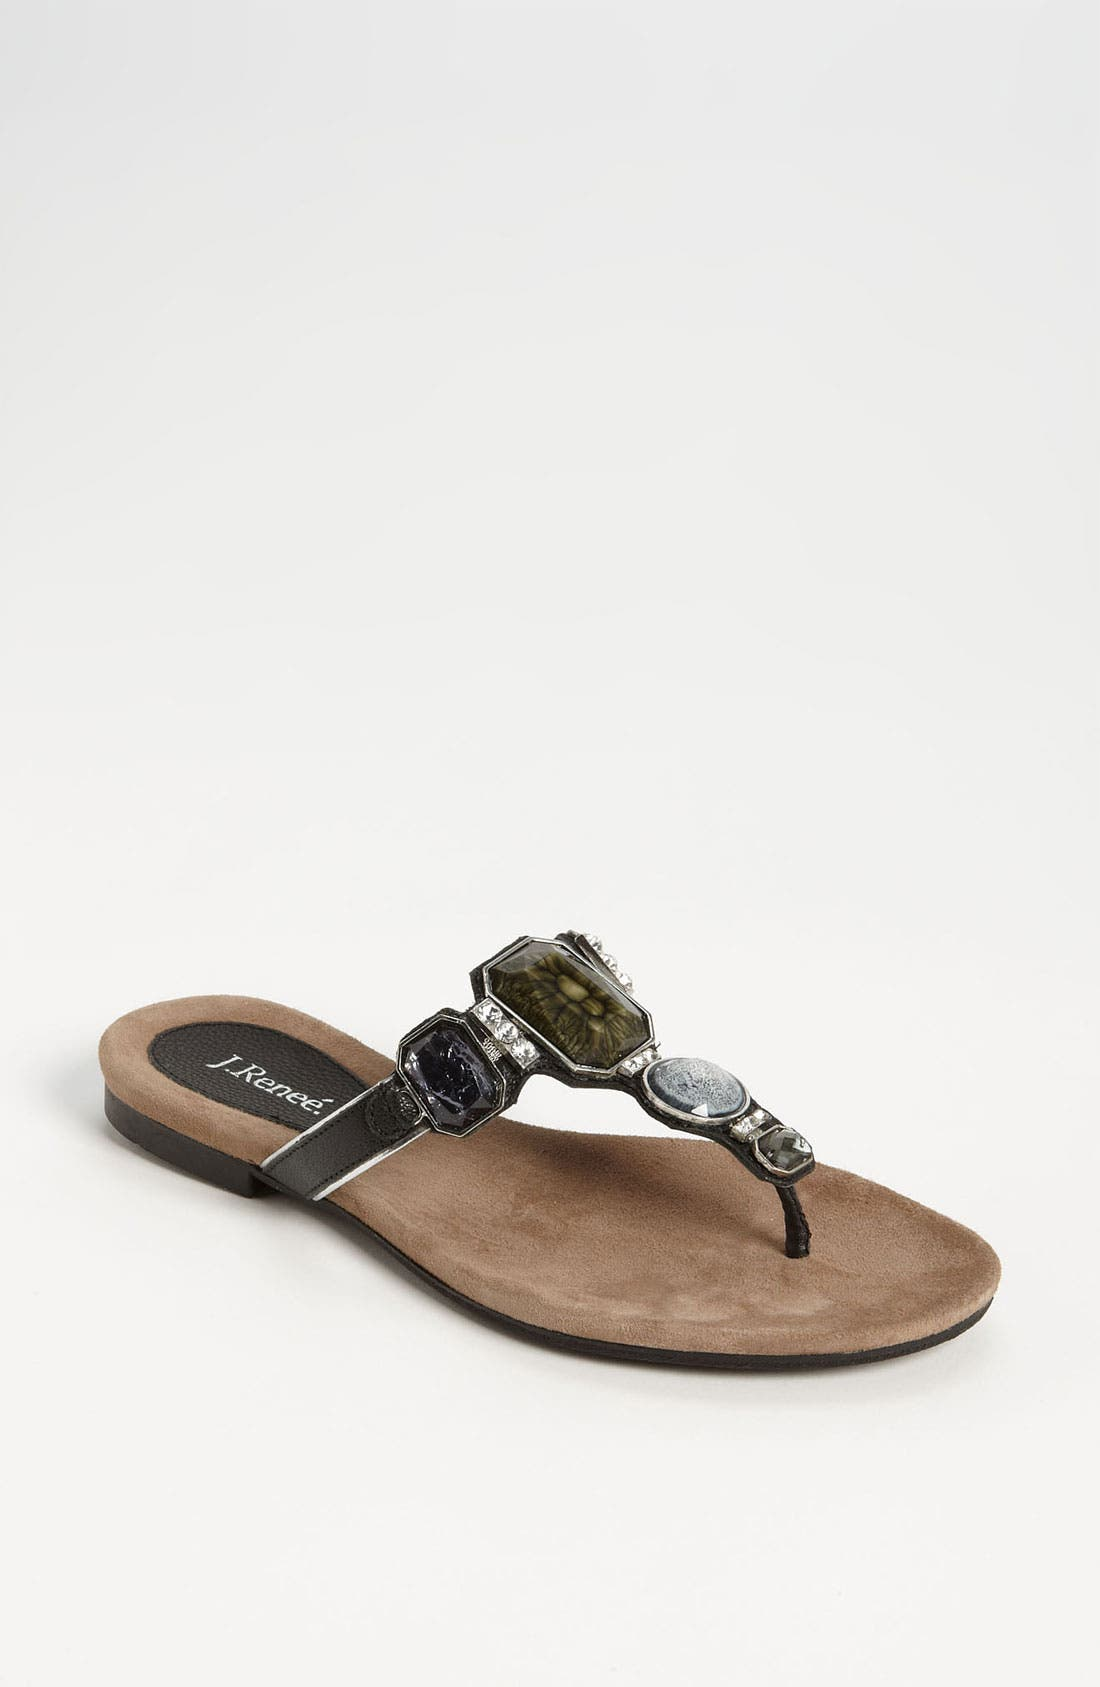 Alternate Image 1 Selected - J. Reneé 'Jasper' Sandal